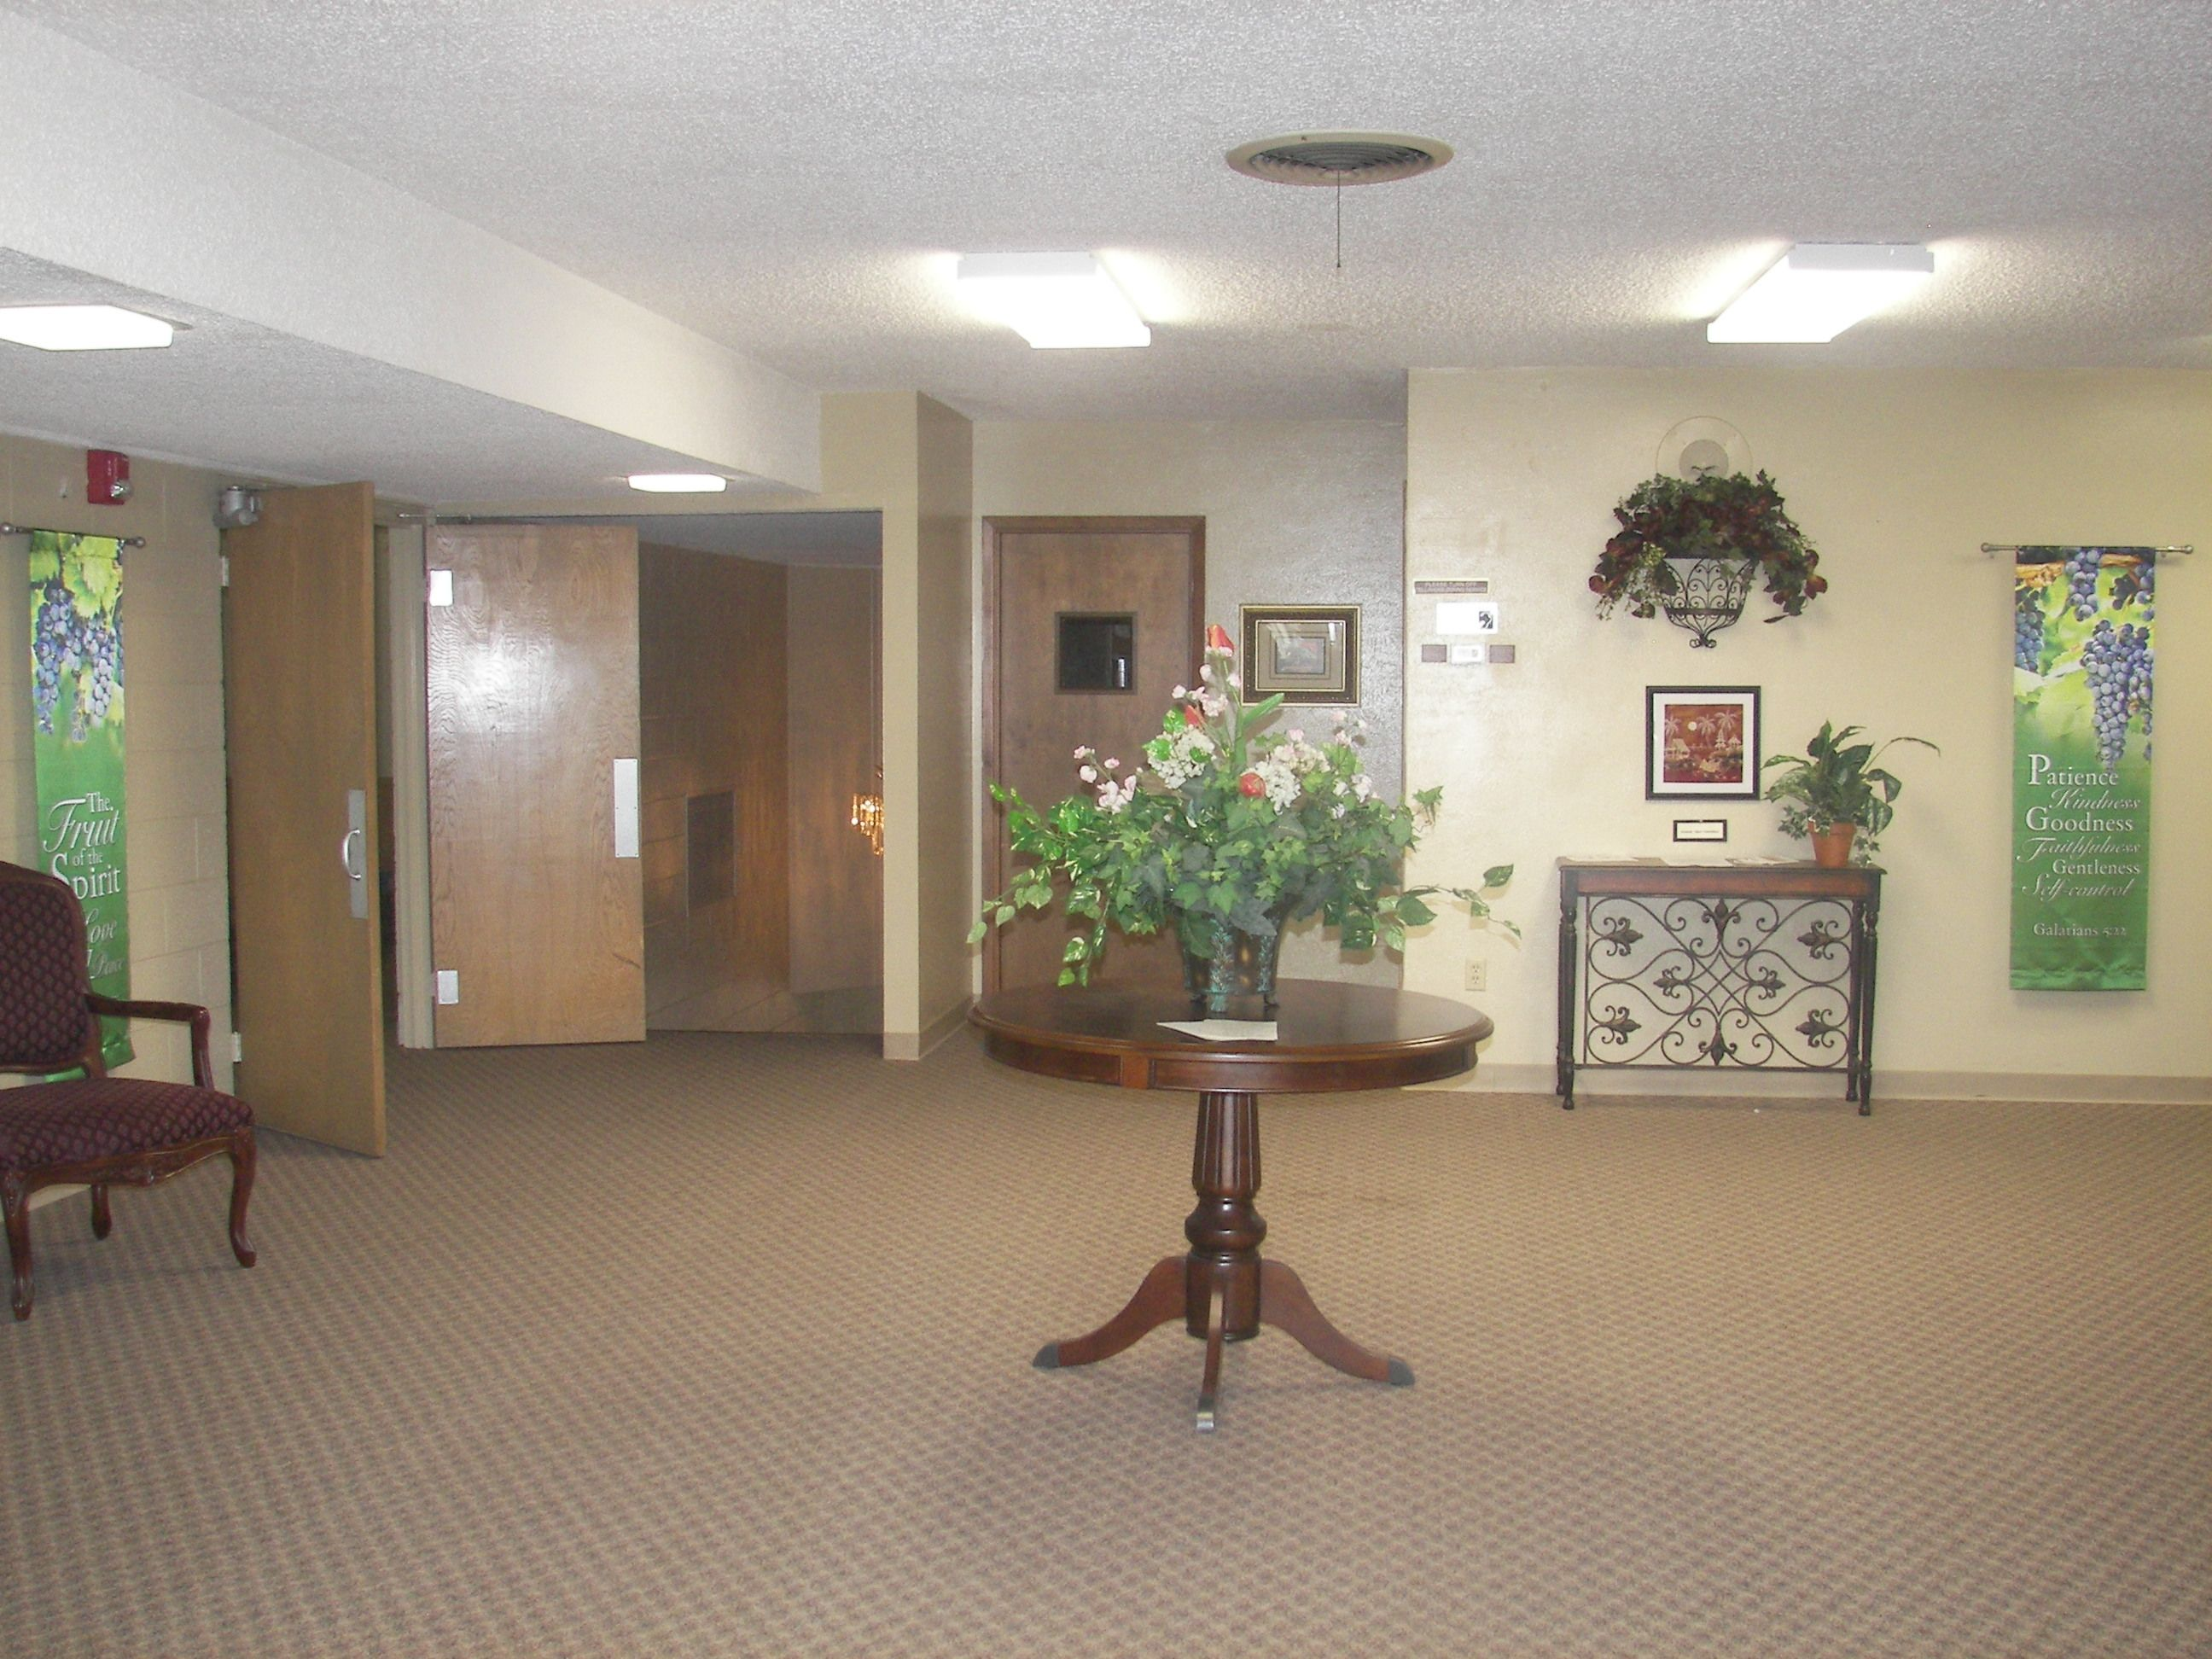 Small Church Foyers | Church Foyer | church decor | Pinterest ...